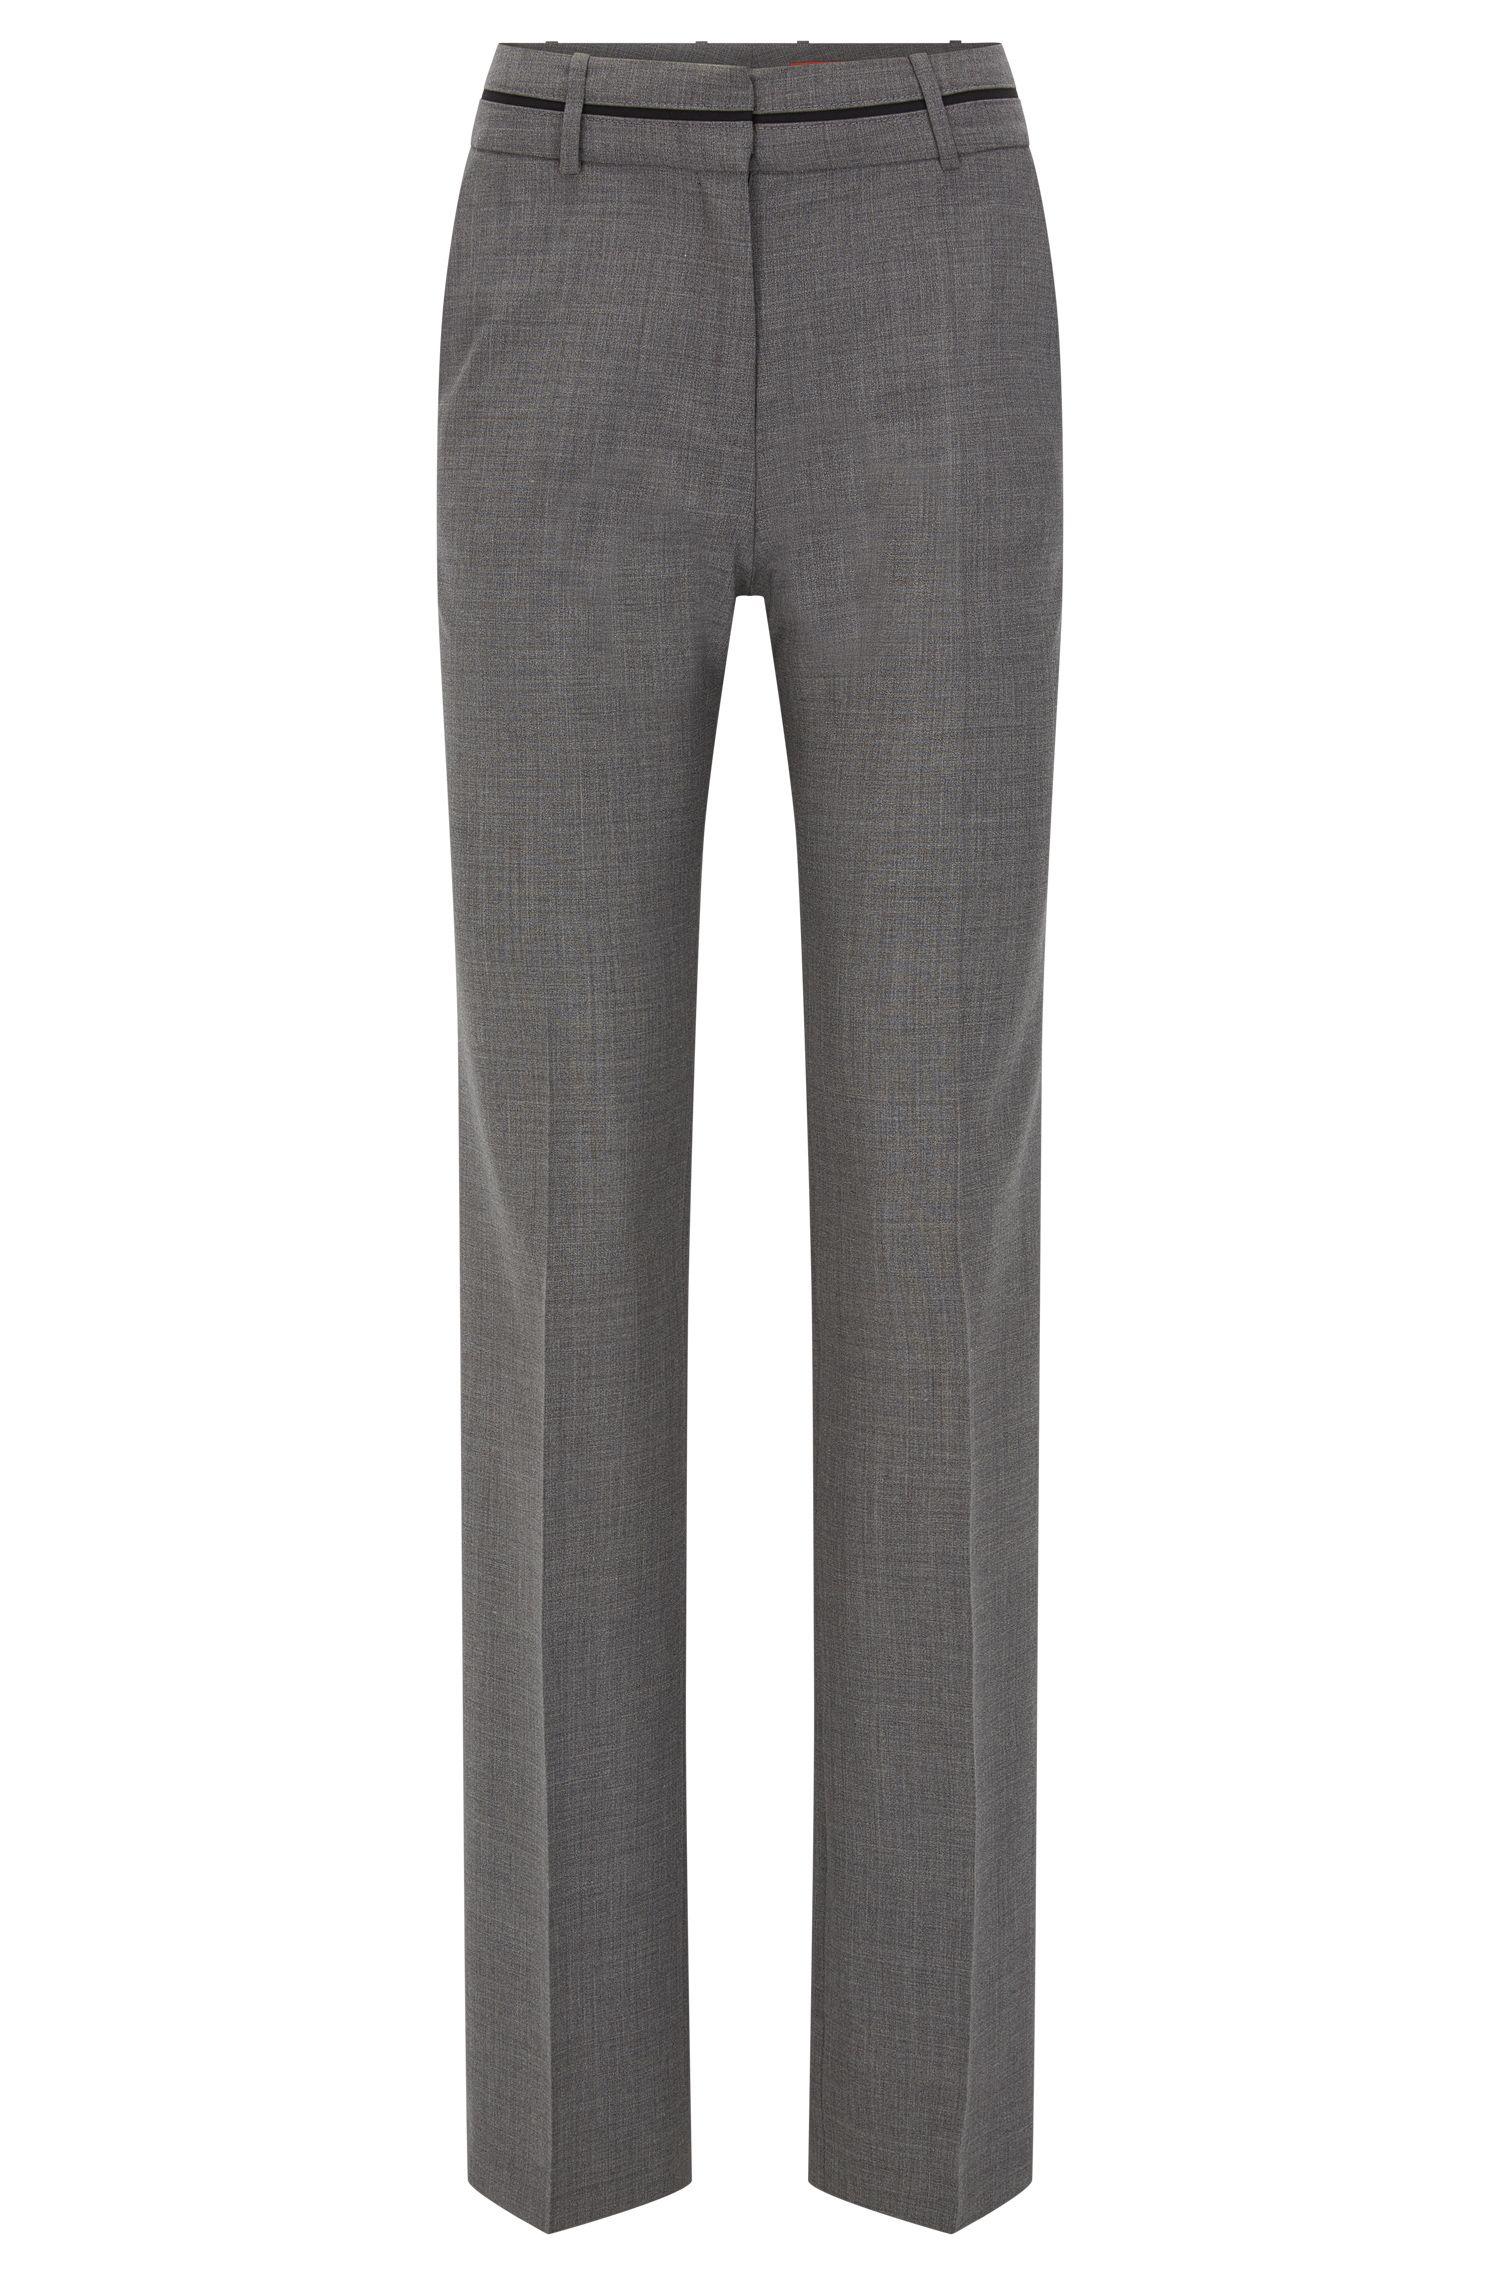 Pantalón regular fit en mezcla de lana virgen